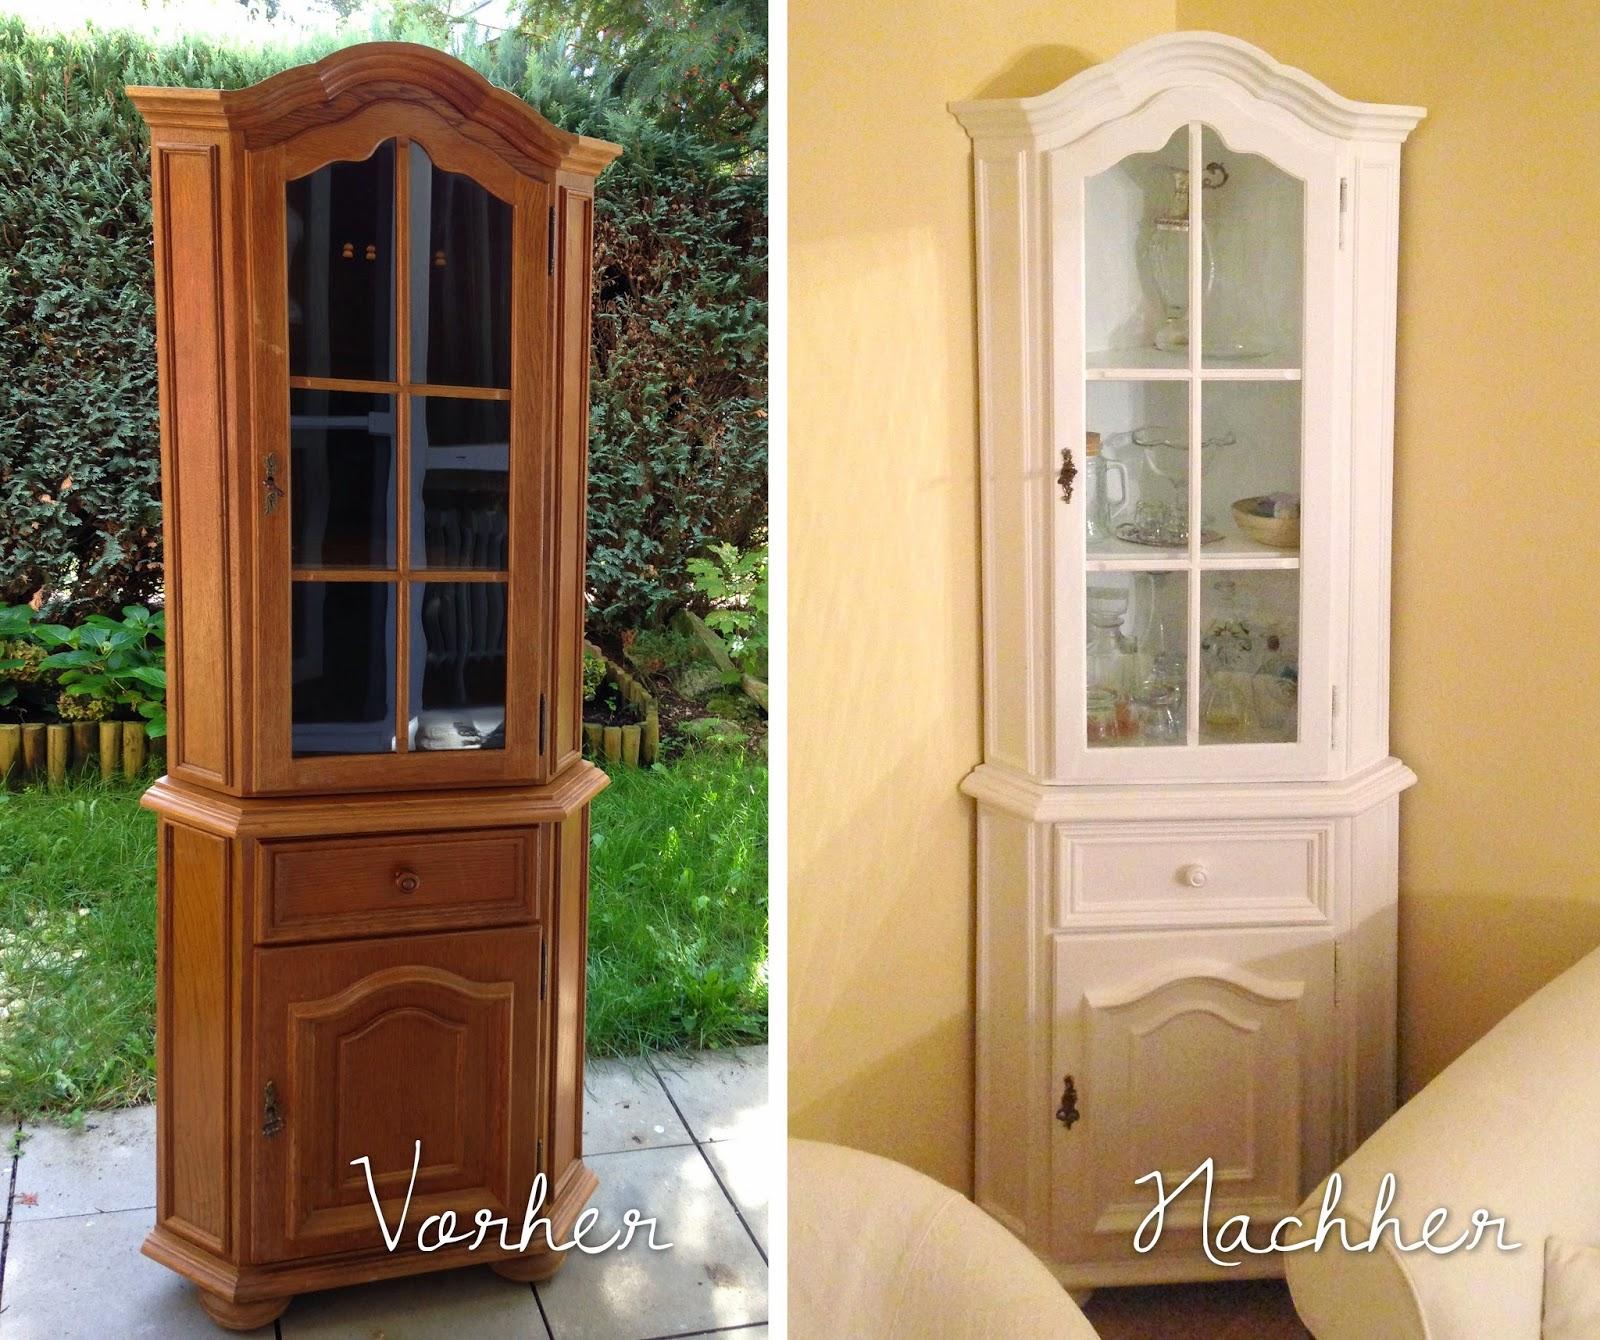 handcraftmarie flohmarkt fund der fertige schrank. Black Bedroom Furniture Sets. Home Design Ideas